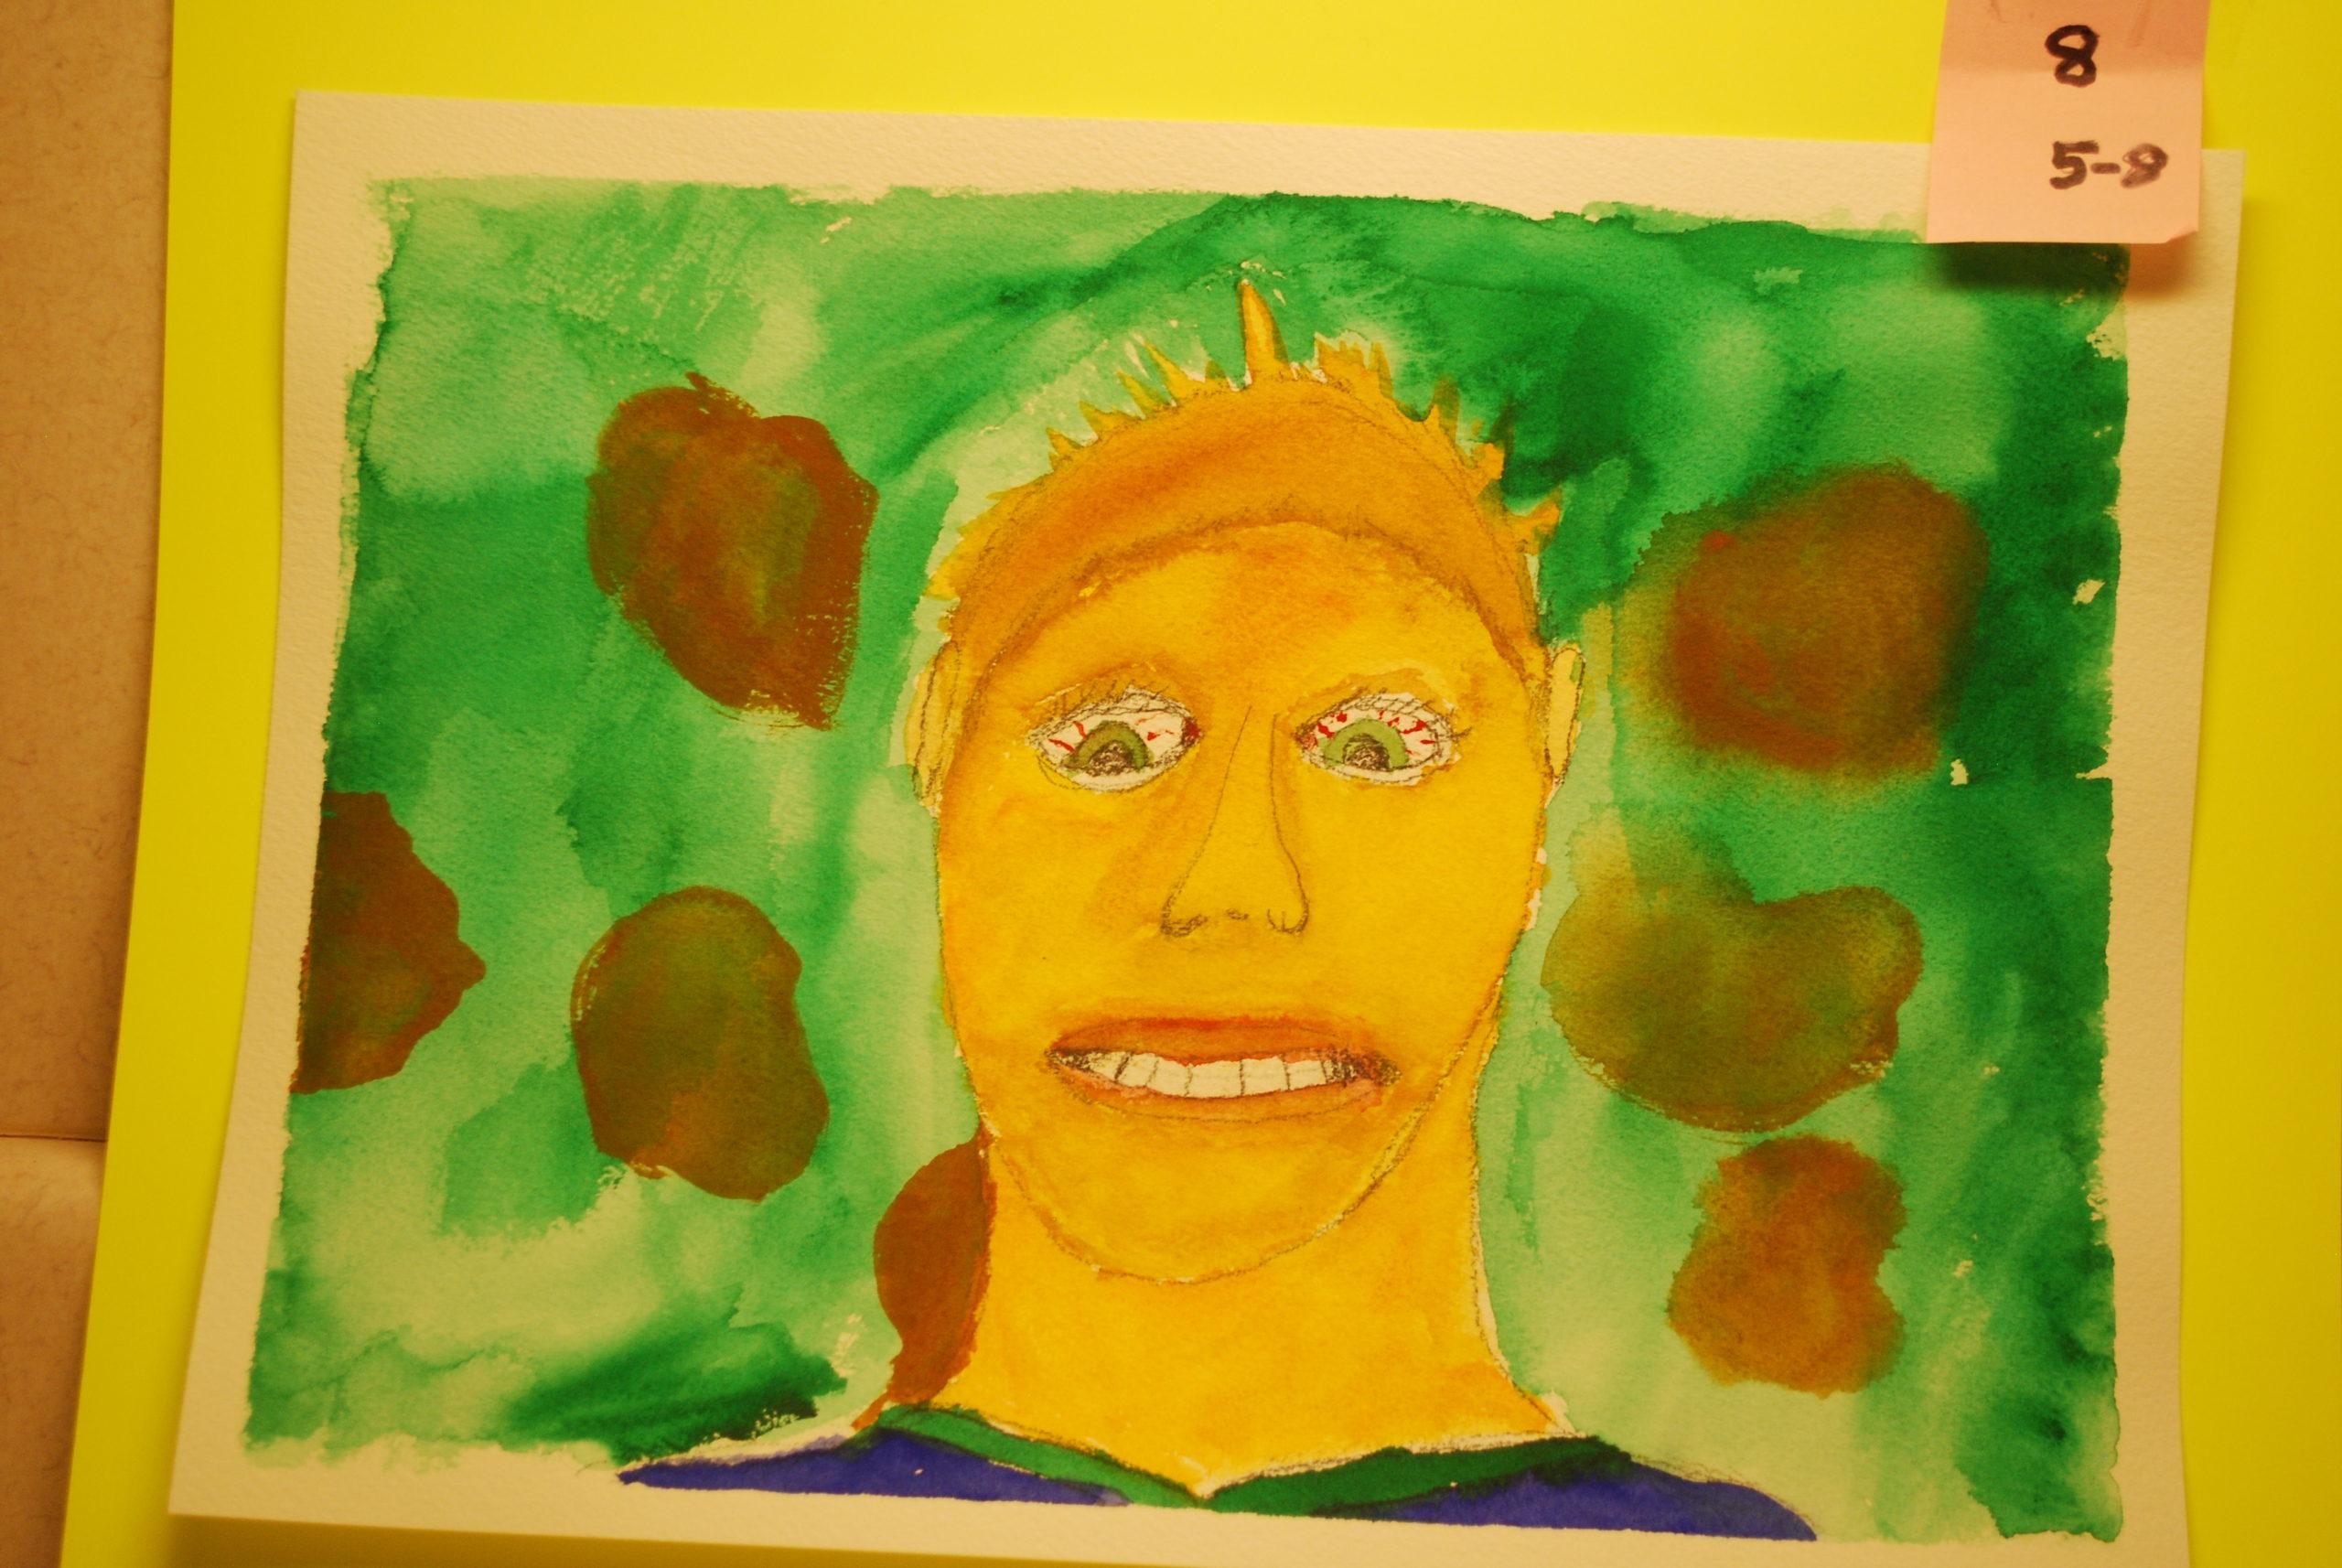 YAC 2020 #8 5-8 yellow face a